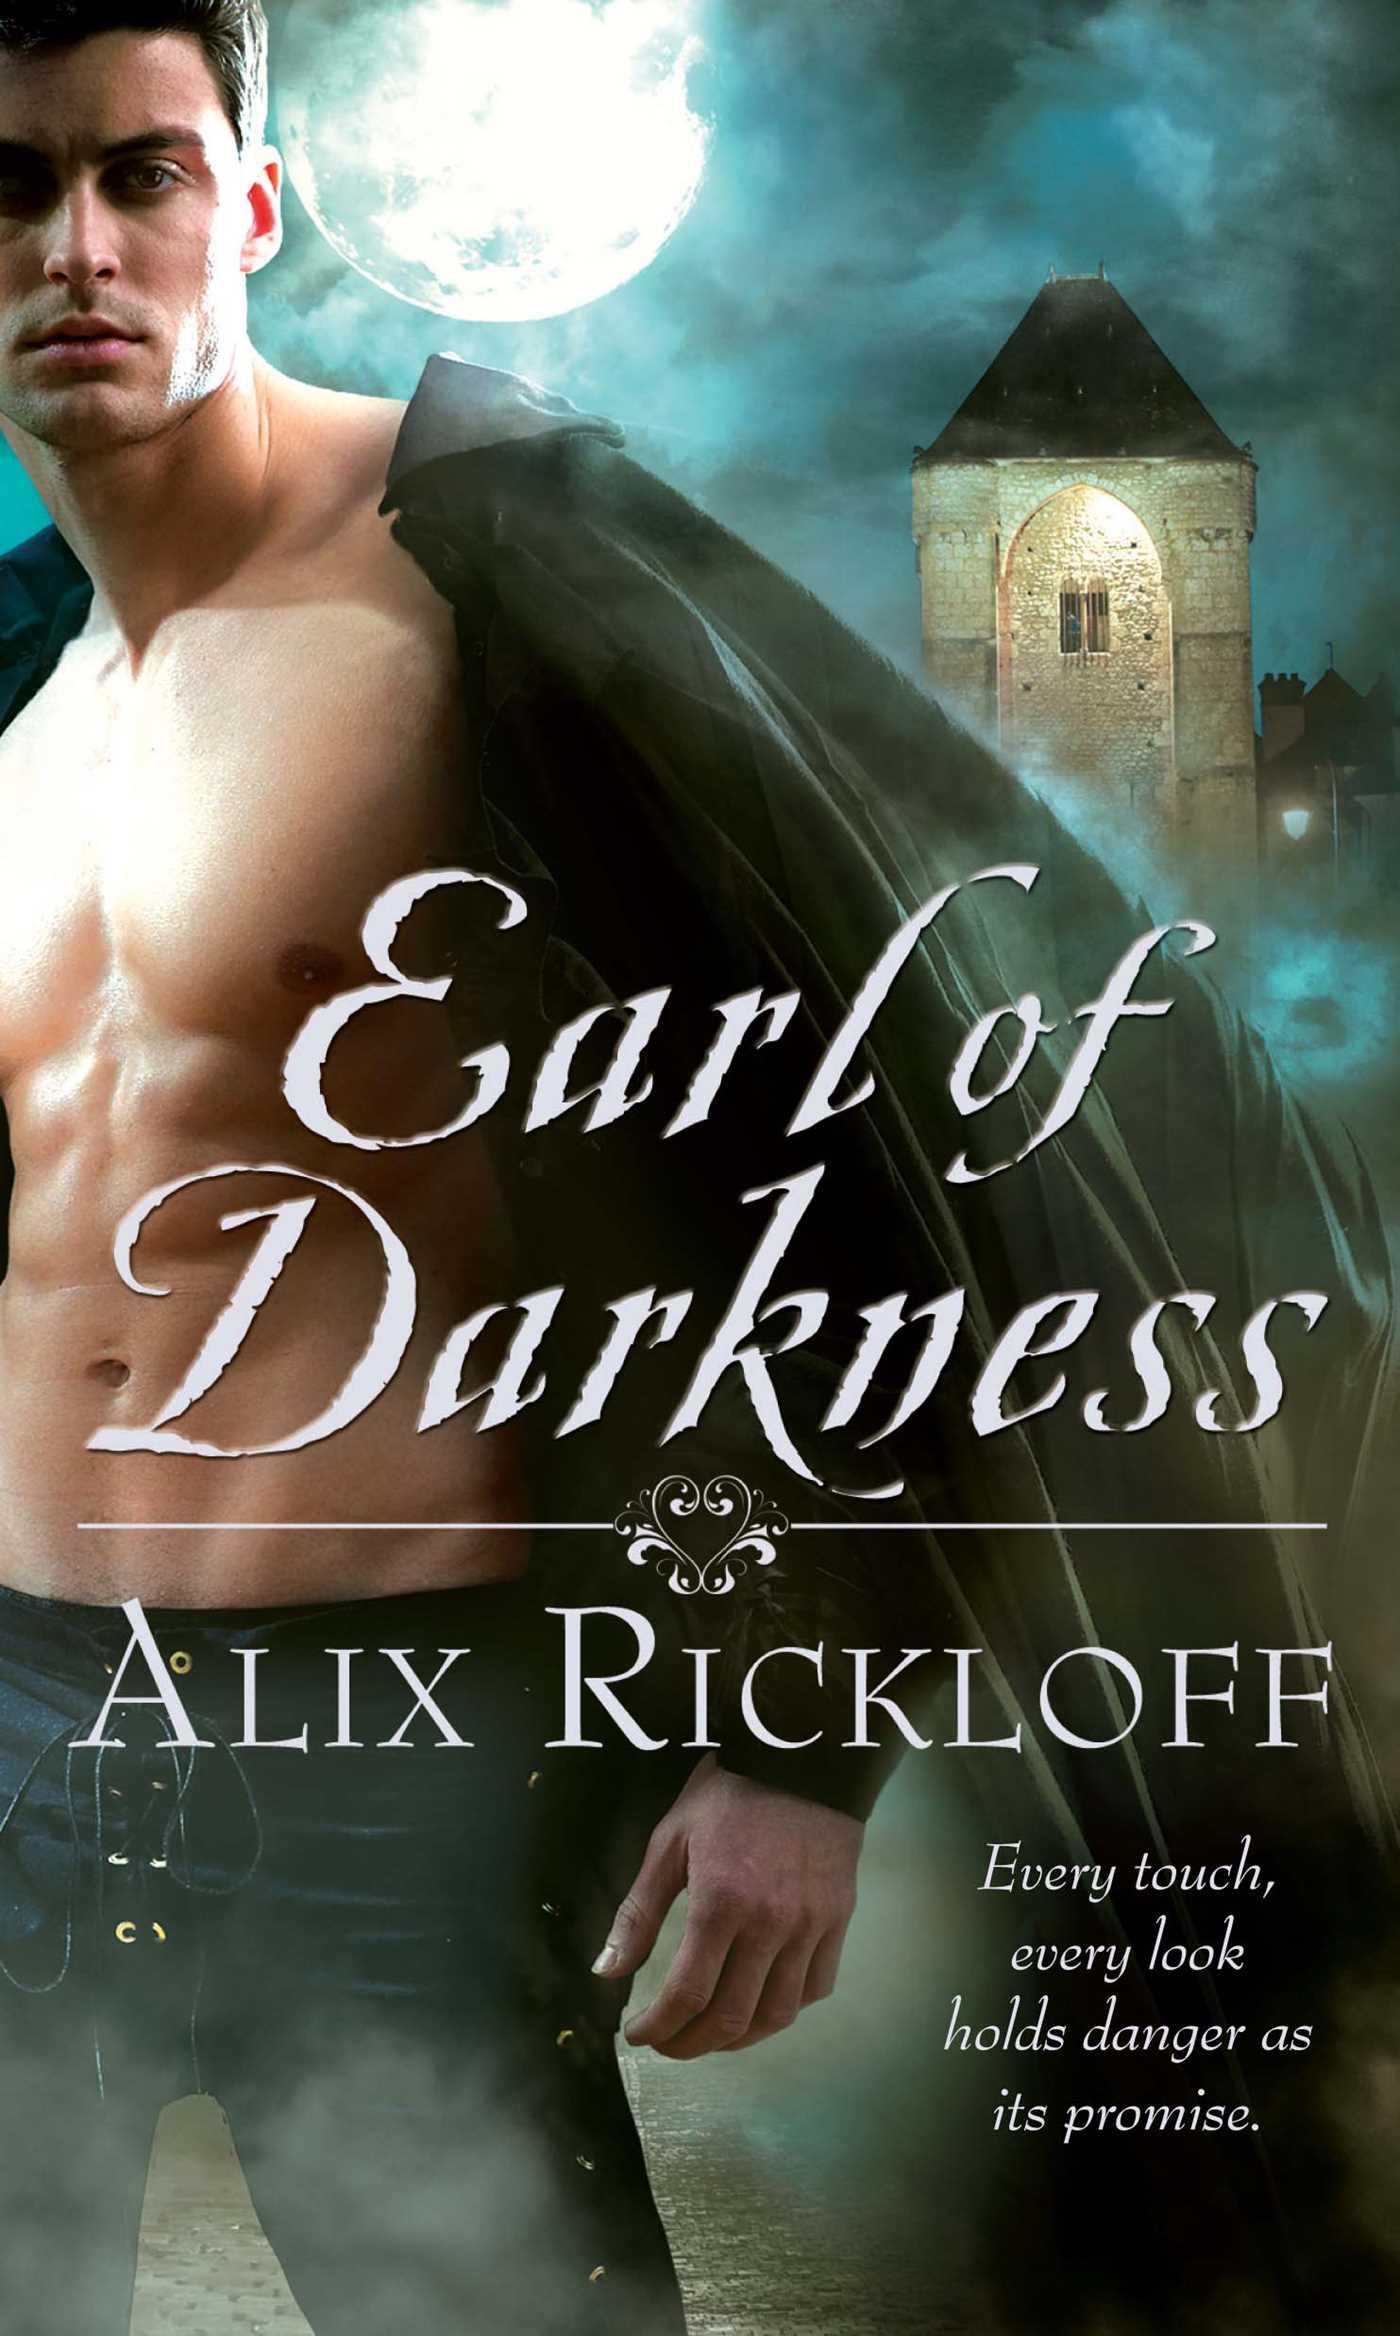 Earl of darkness 9781439170588 hr